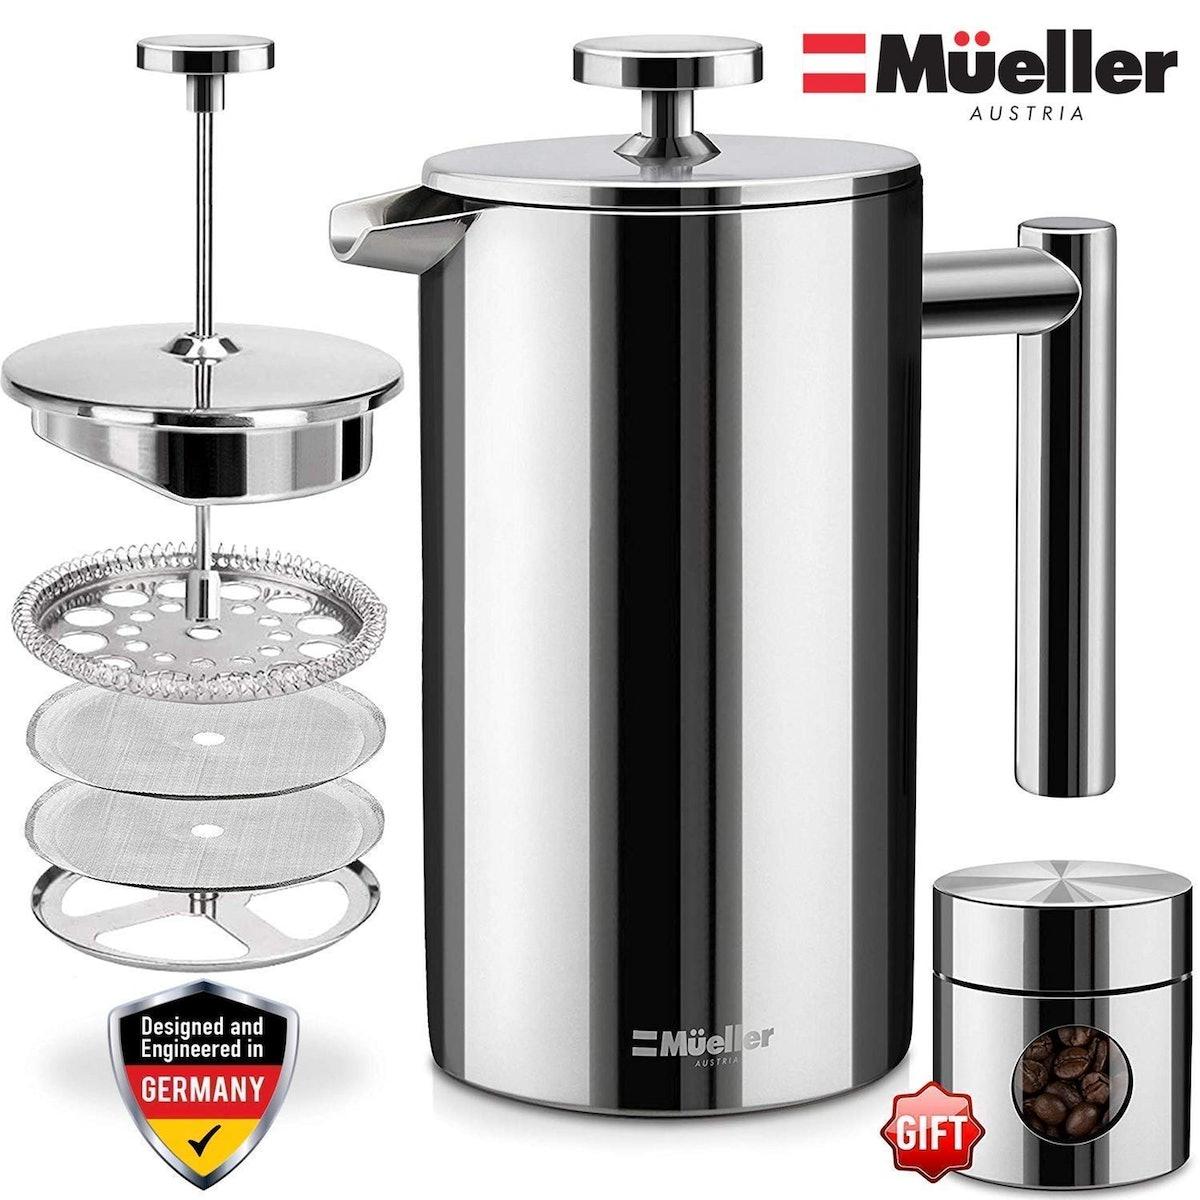 Mueller Austria French Press Coffee Maker